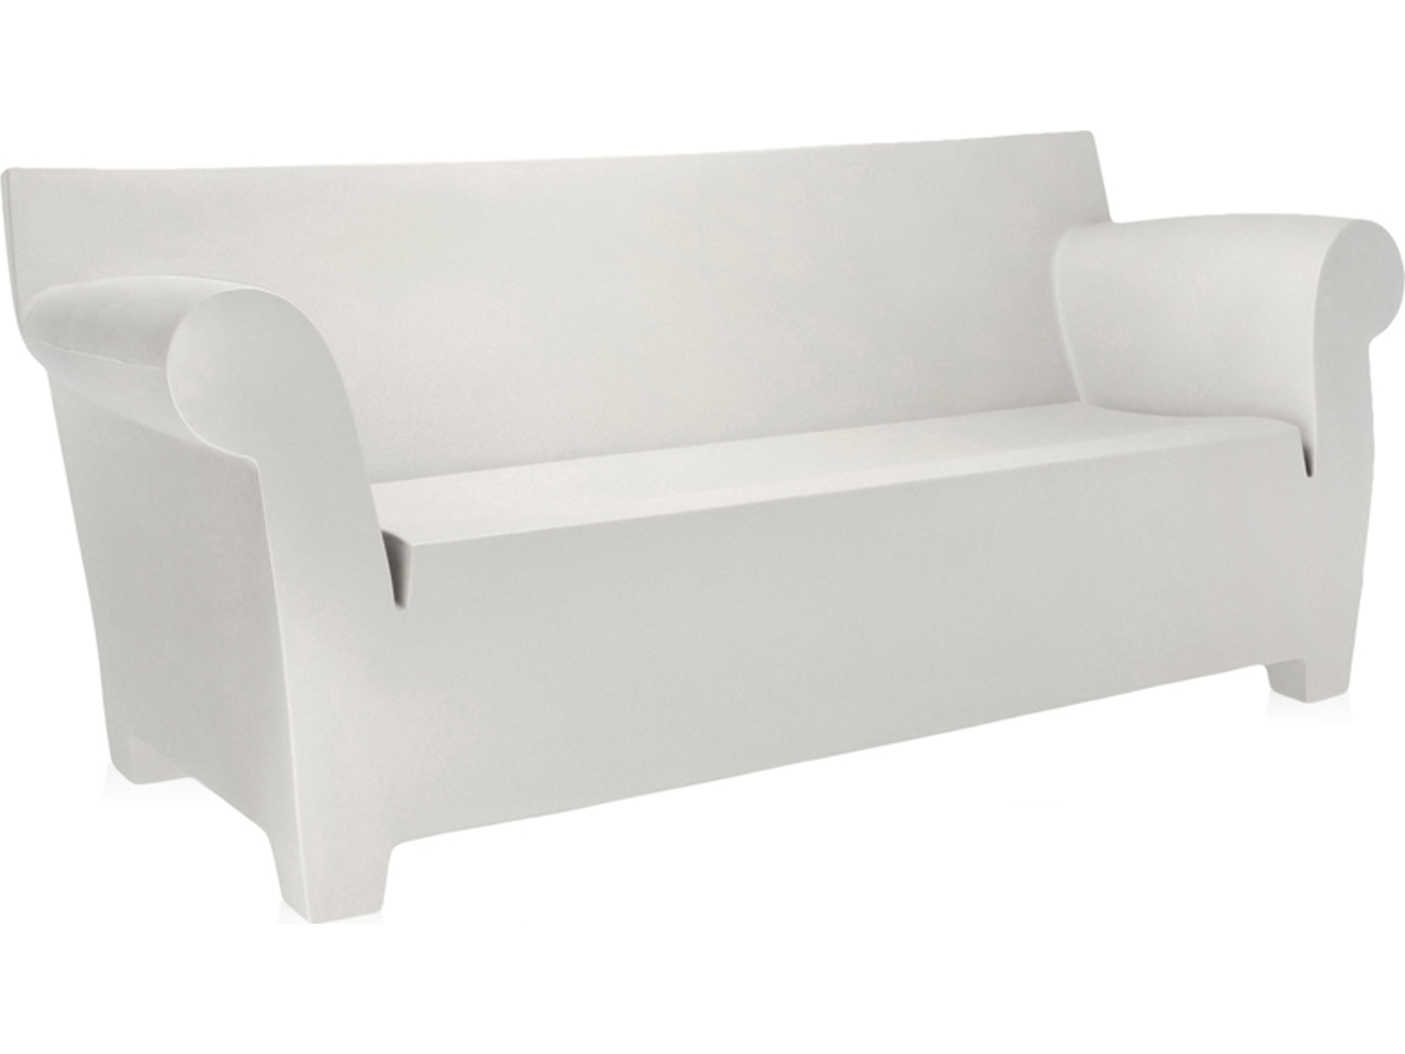 kartell bubble club sofa gebraucht napa lounger with storage zinc white kar605060